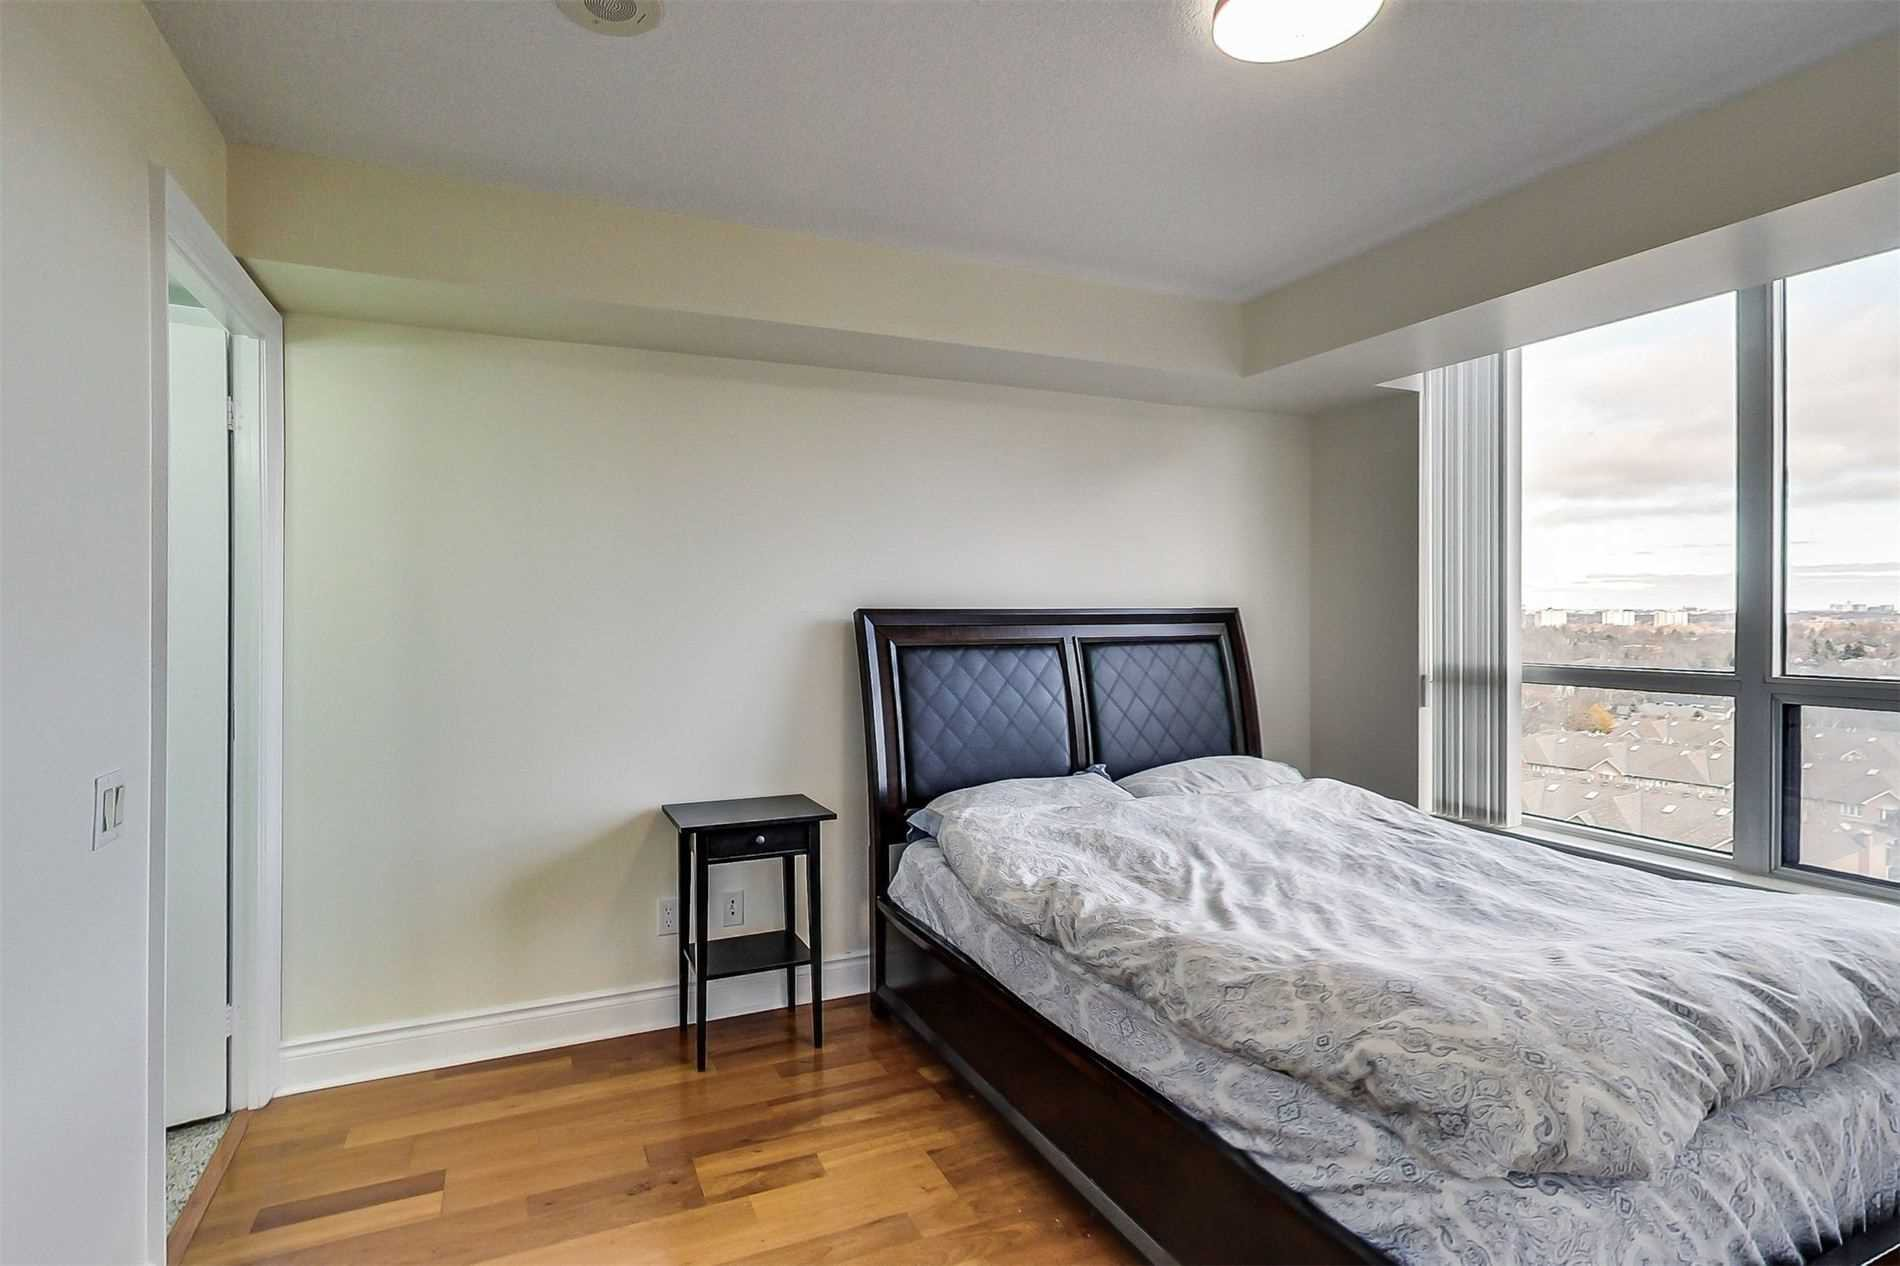 Photo 19: Photos: 1204 10 Northtown Way in Toronto: Willowdale East Condo for sale (Toronto C14)  : MLS®# C4648371